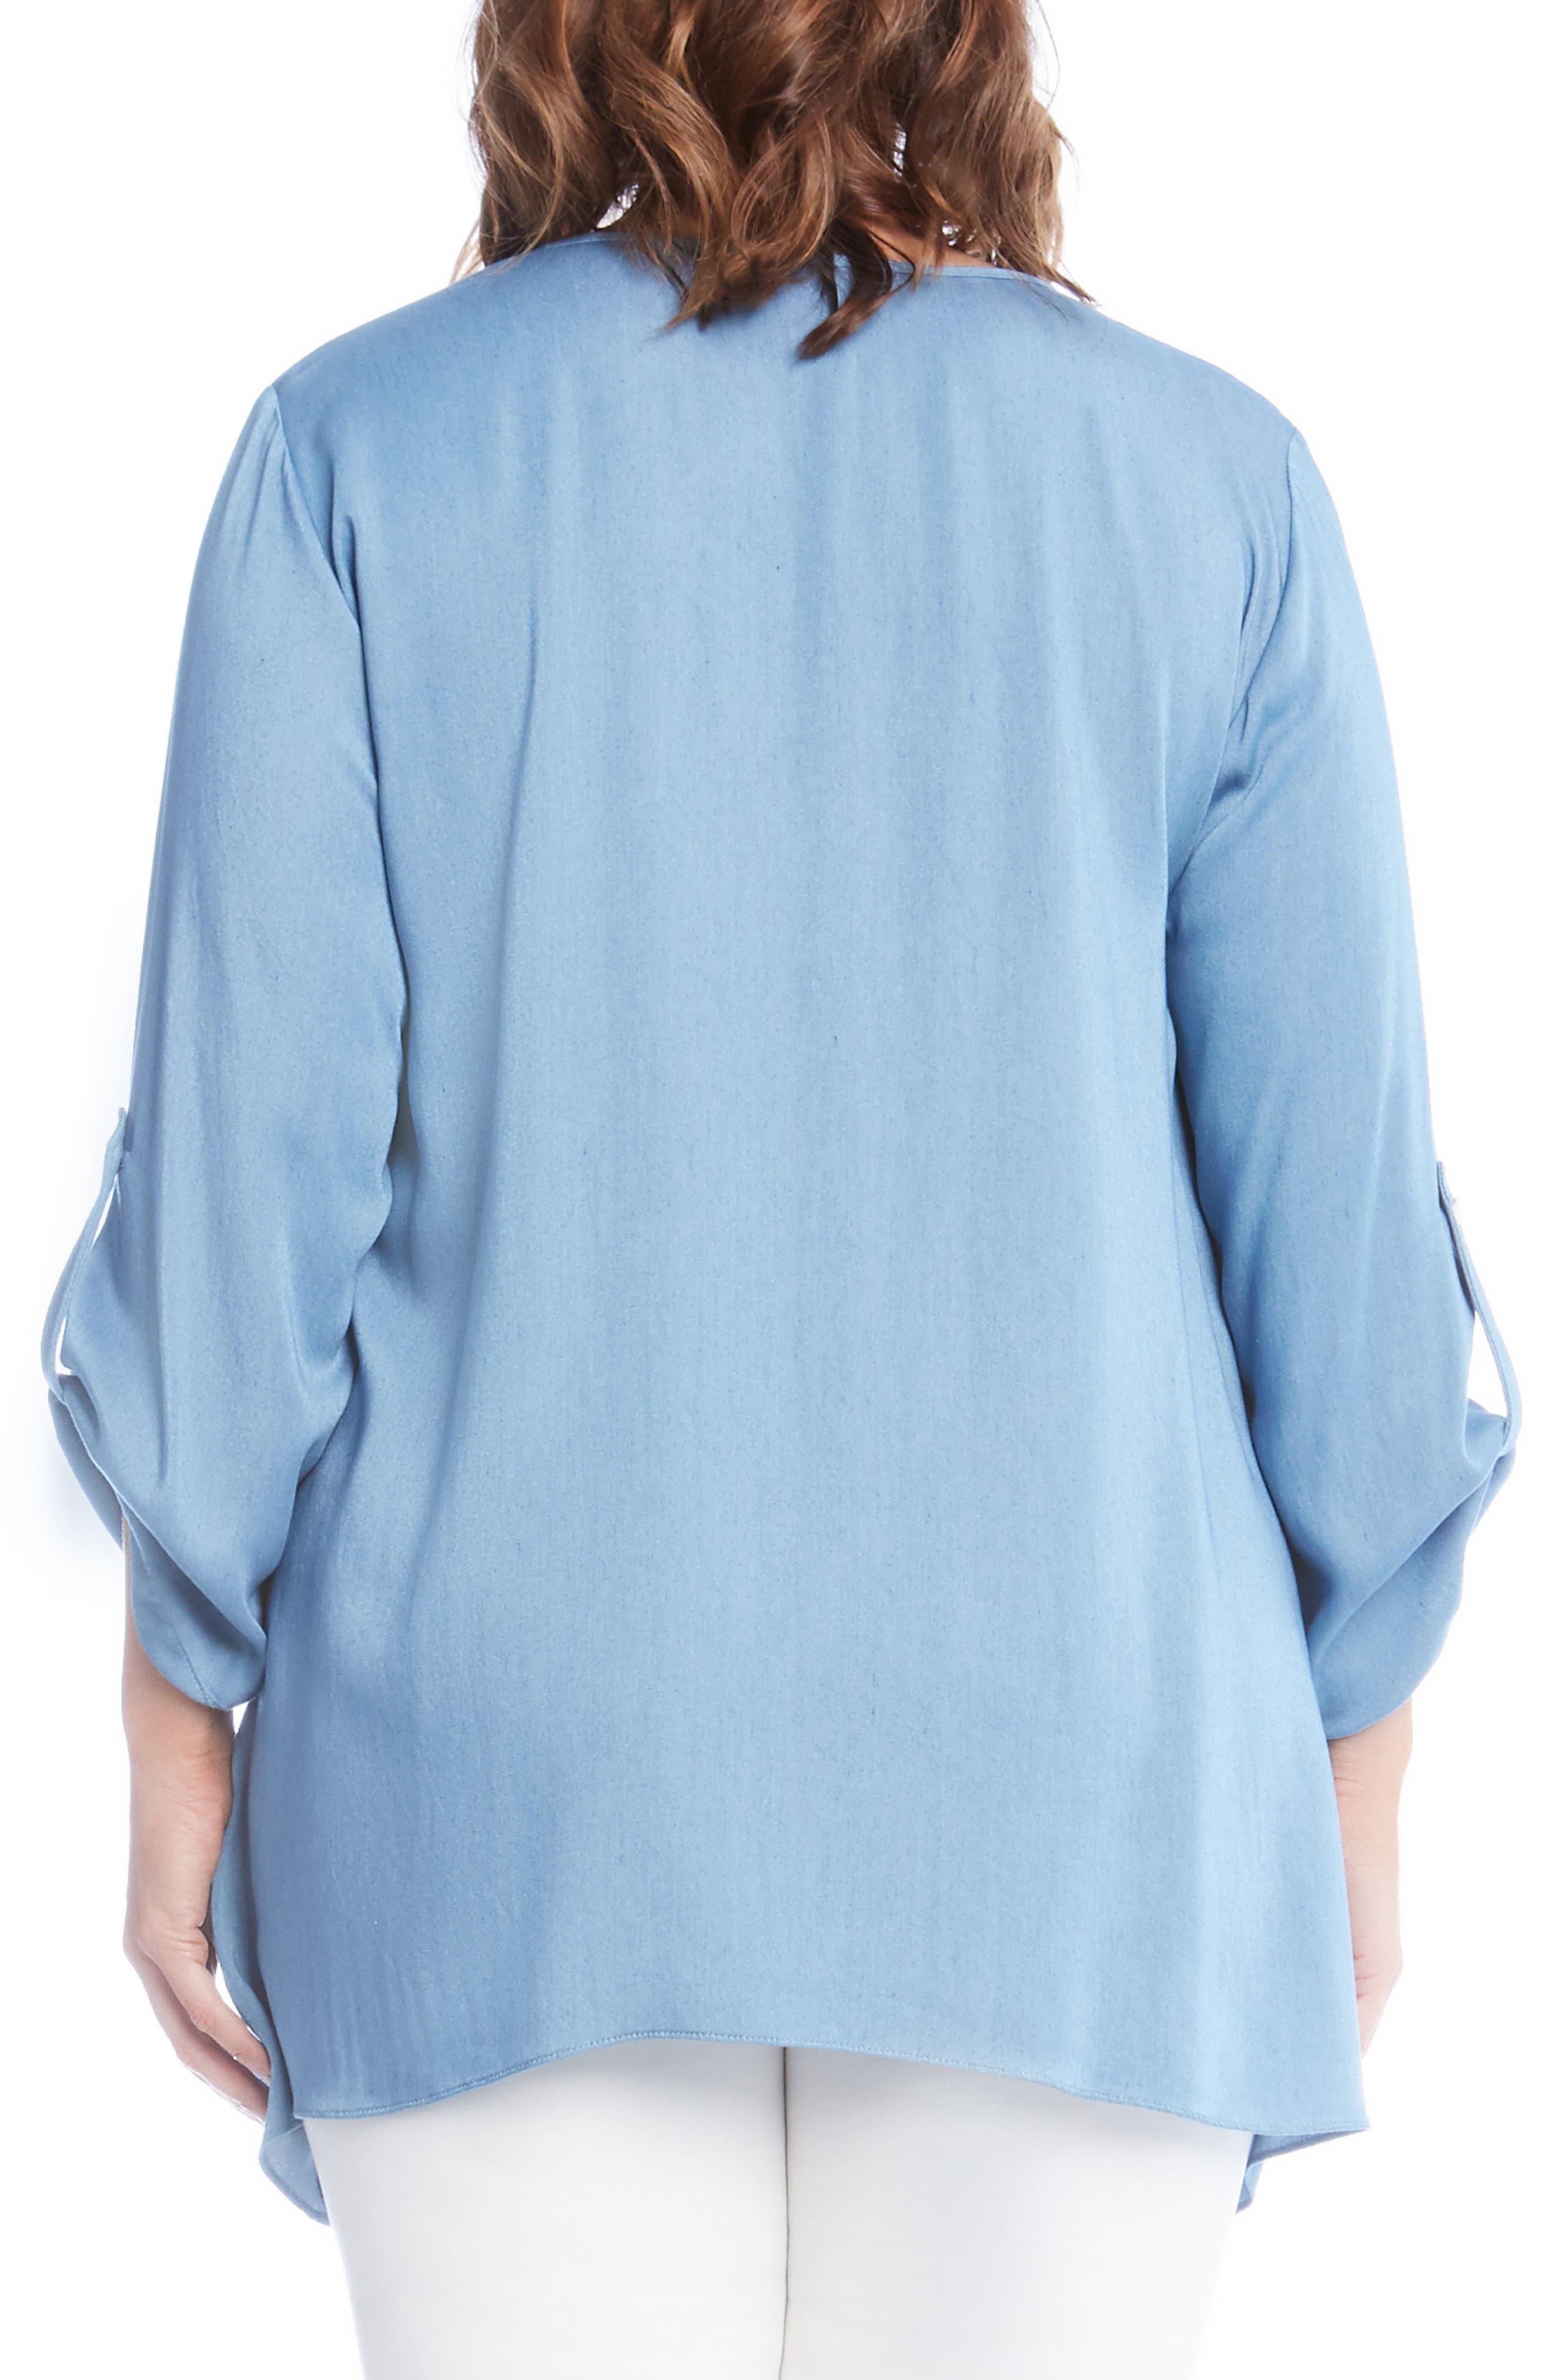 Alternate Image 2  - Karen Kane Chambray Handkerchief Top (Plus Size)